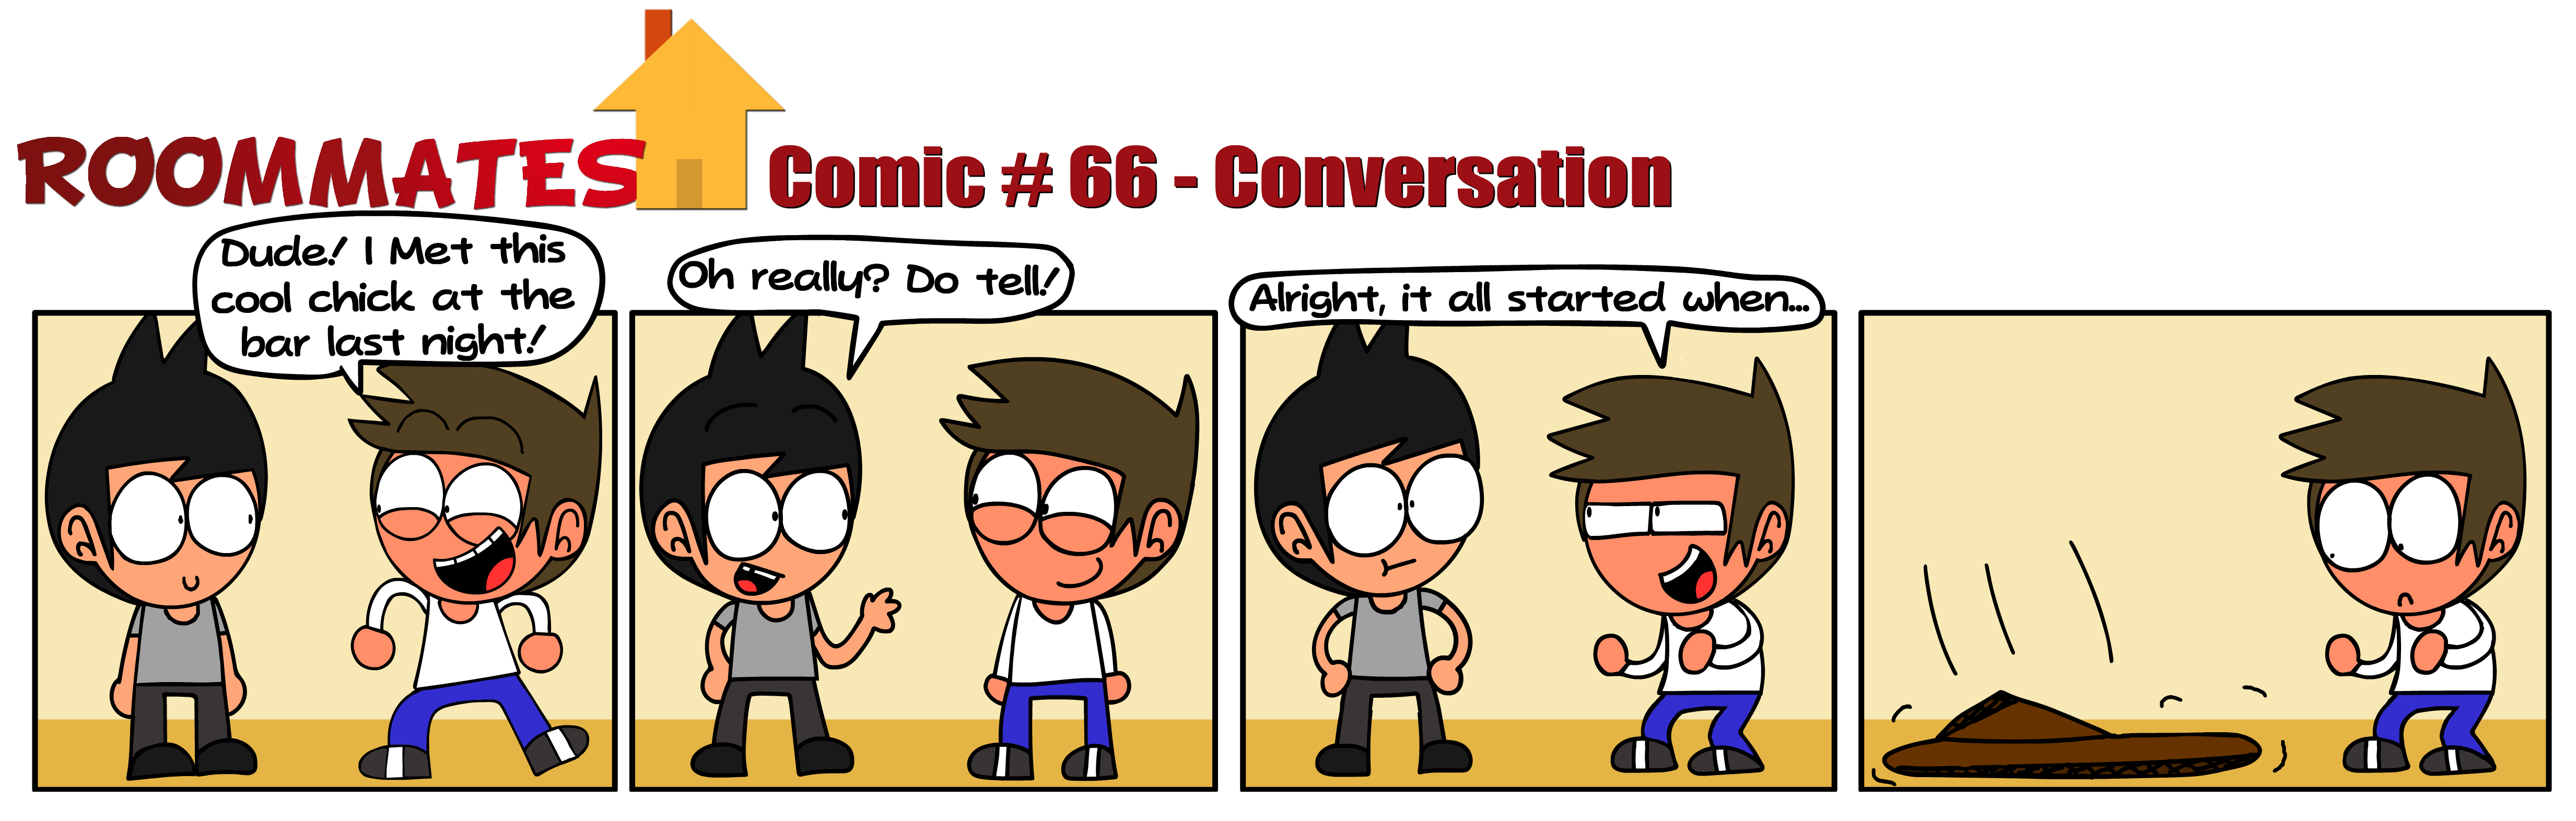 Roommates - Conversation (Comic #66)